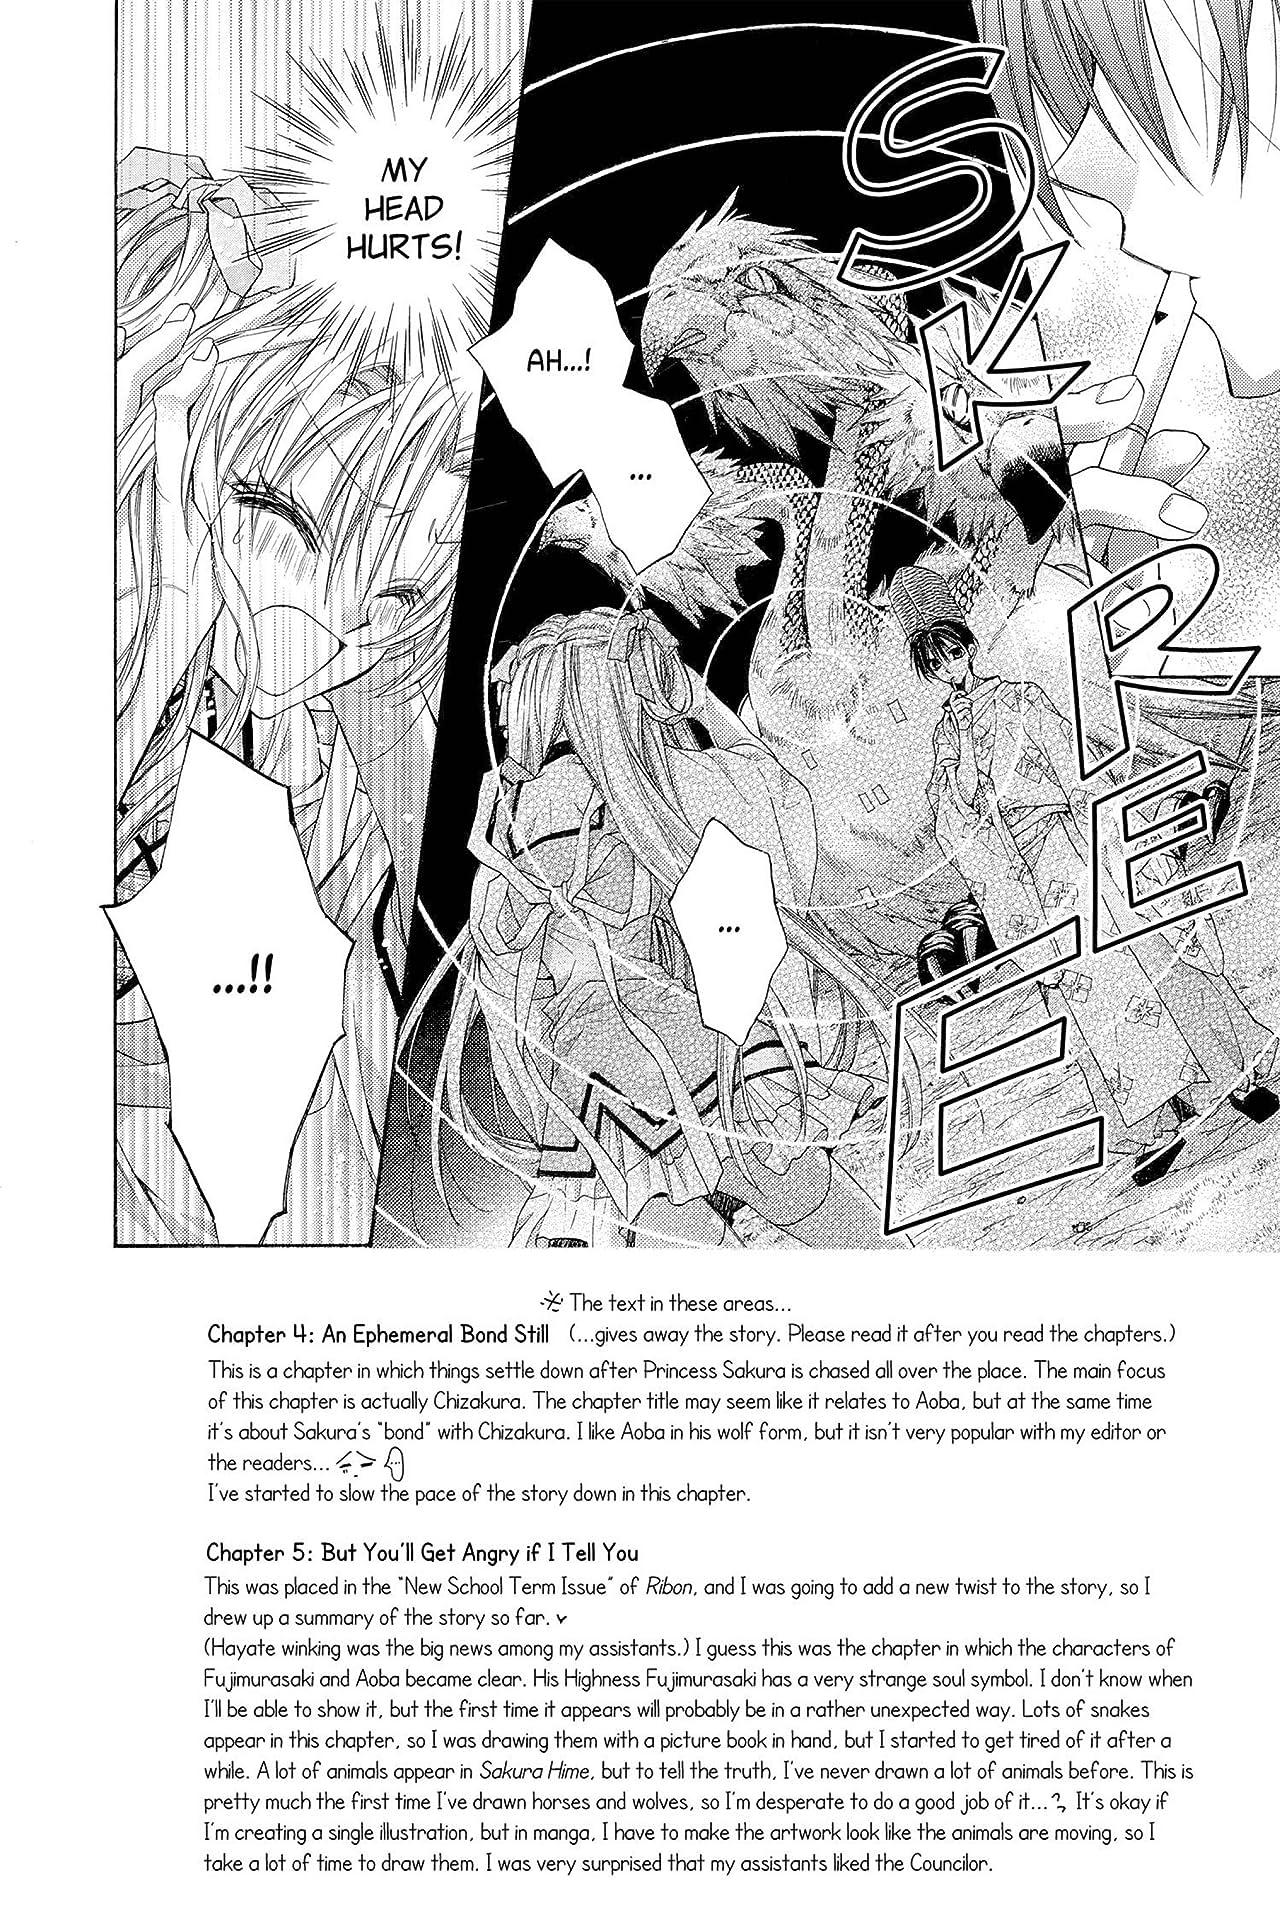 Sakura Hime: The Legend of Princess Sakura Vol. 2